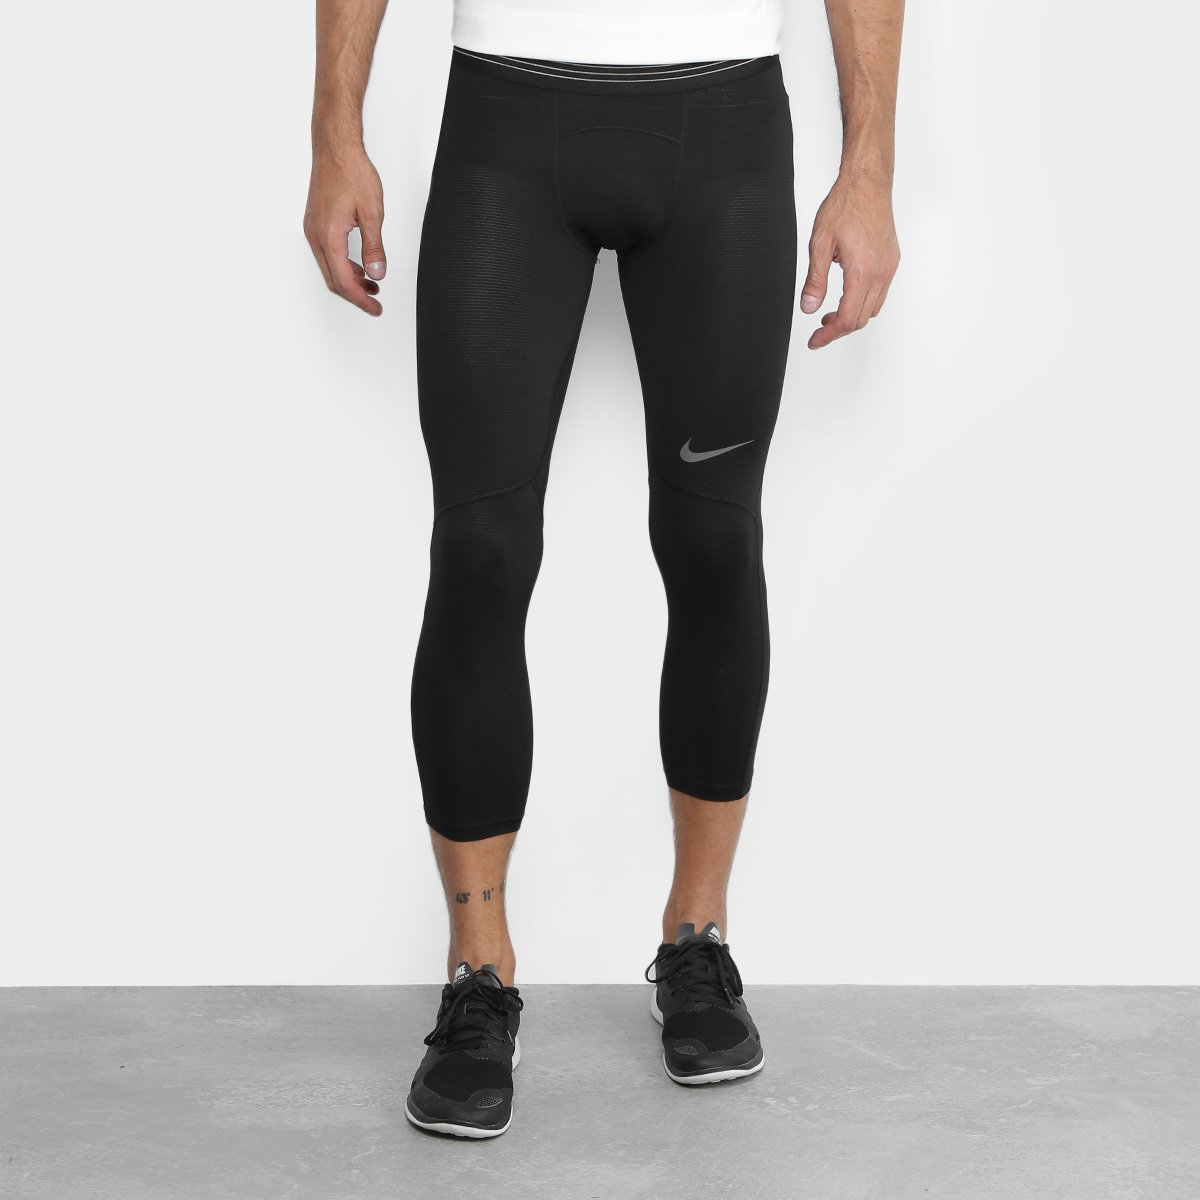 Calça Nike Pro Hypercool Tight Masculino - Compre Agora  2fa04c0ab8c1e